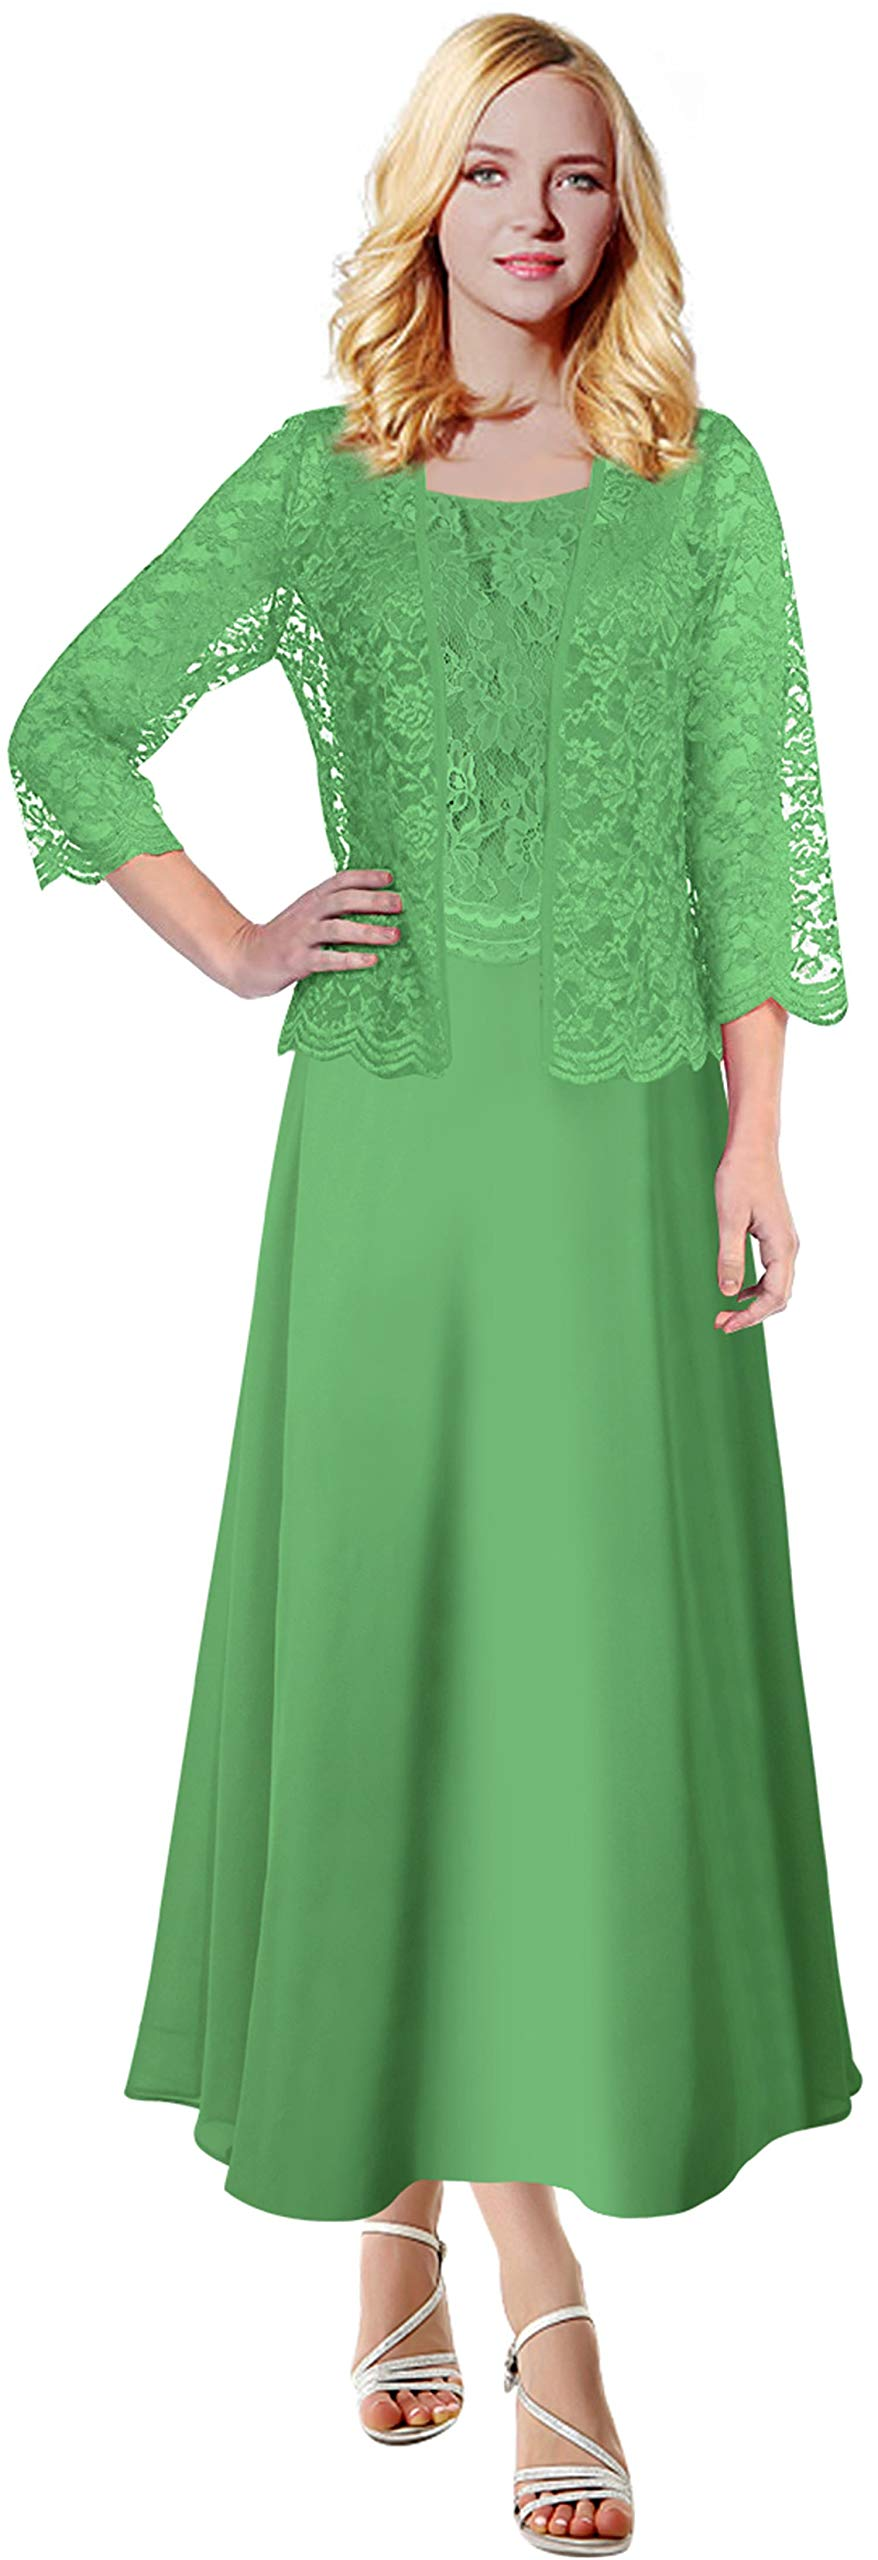 4086db1655cb VaniaDress Women Lace Mother of The Bride Dress with Jacket V108LF Matcha  US6